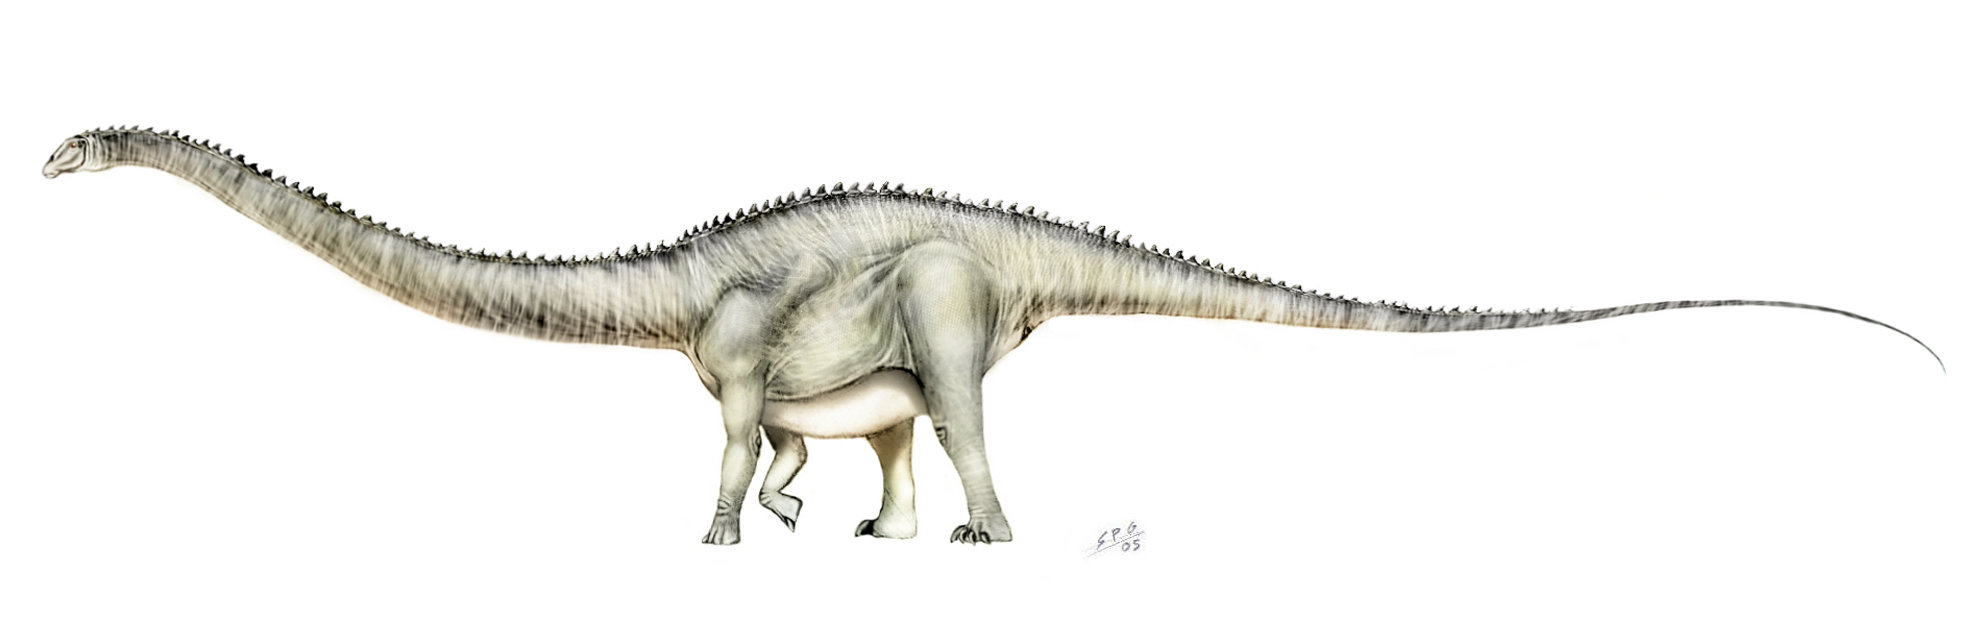 Supersaurus by Sergio Perez